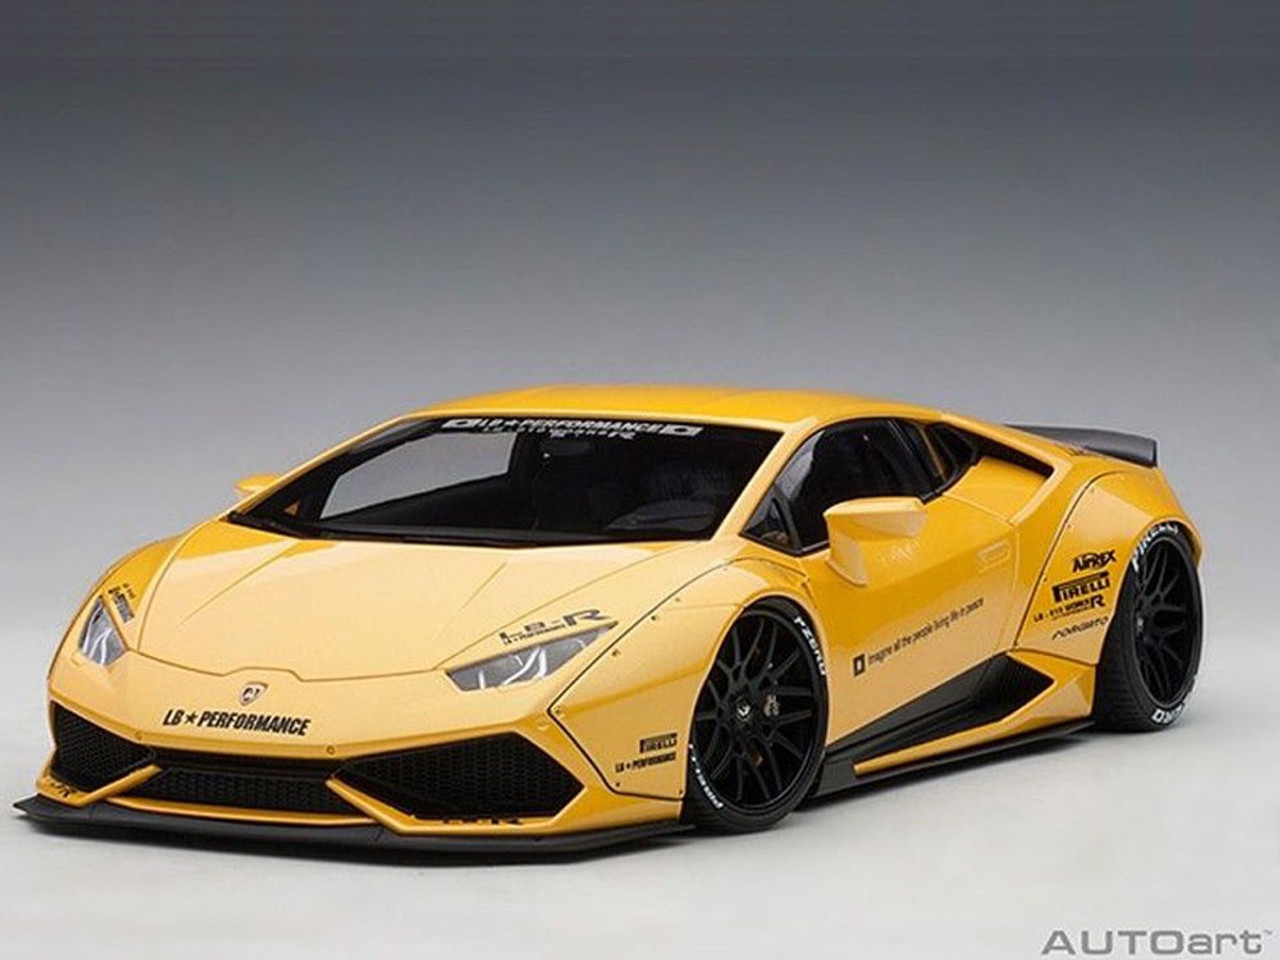 Auto Art 1 18 79124 Liberty Walk Lb Works Lamborghini Huracan Yellow Hobby Station